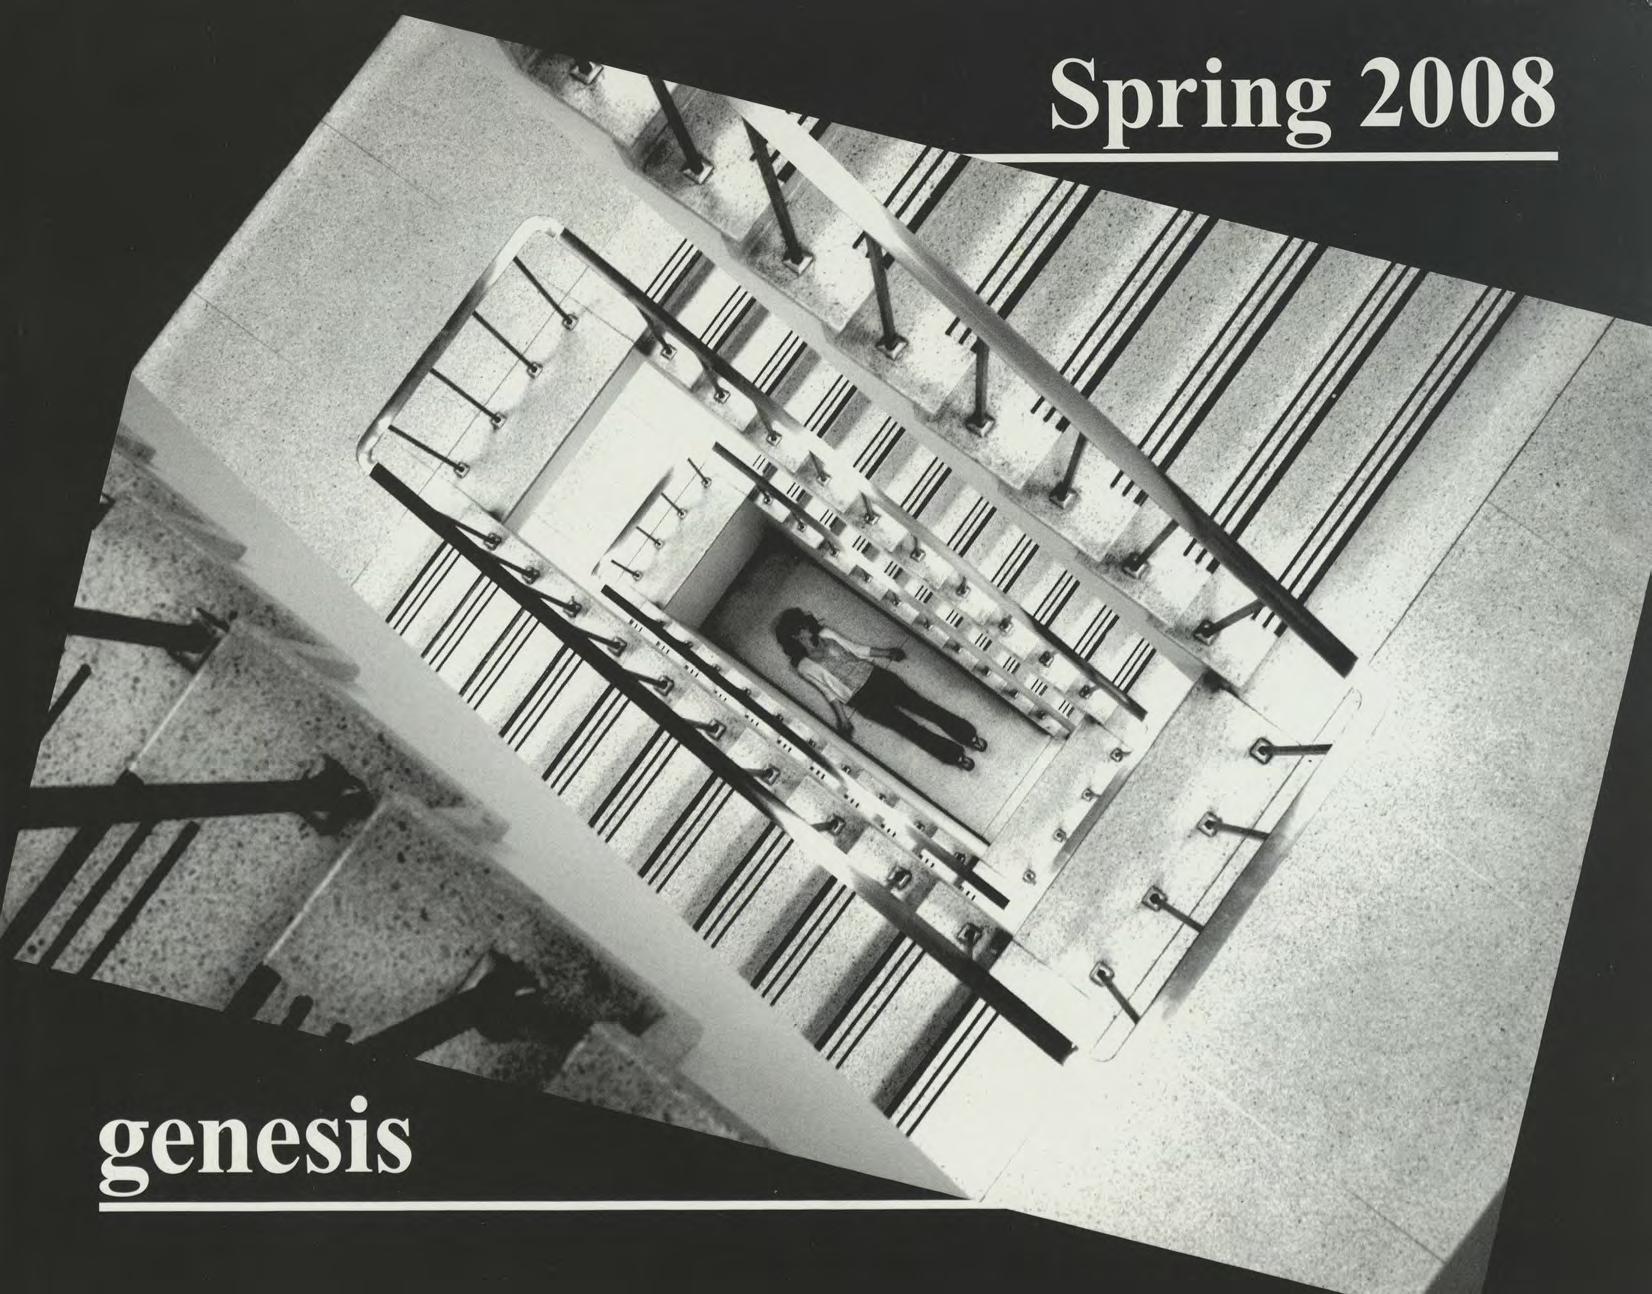 genesis spring 2008 cover